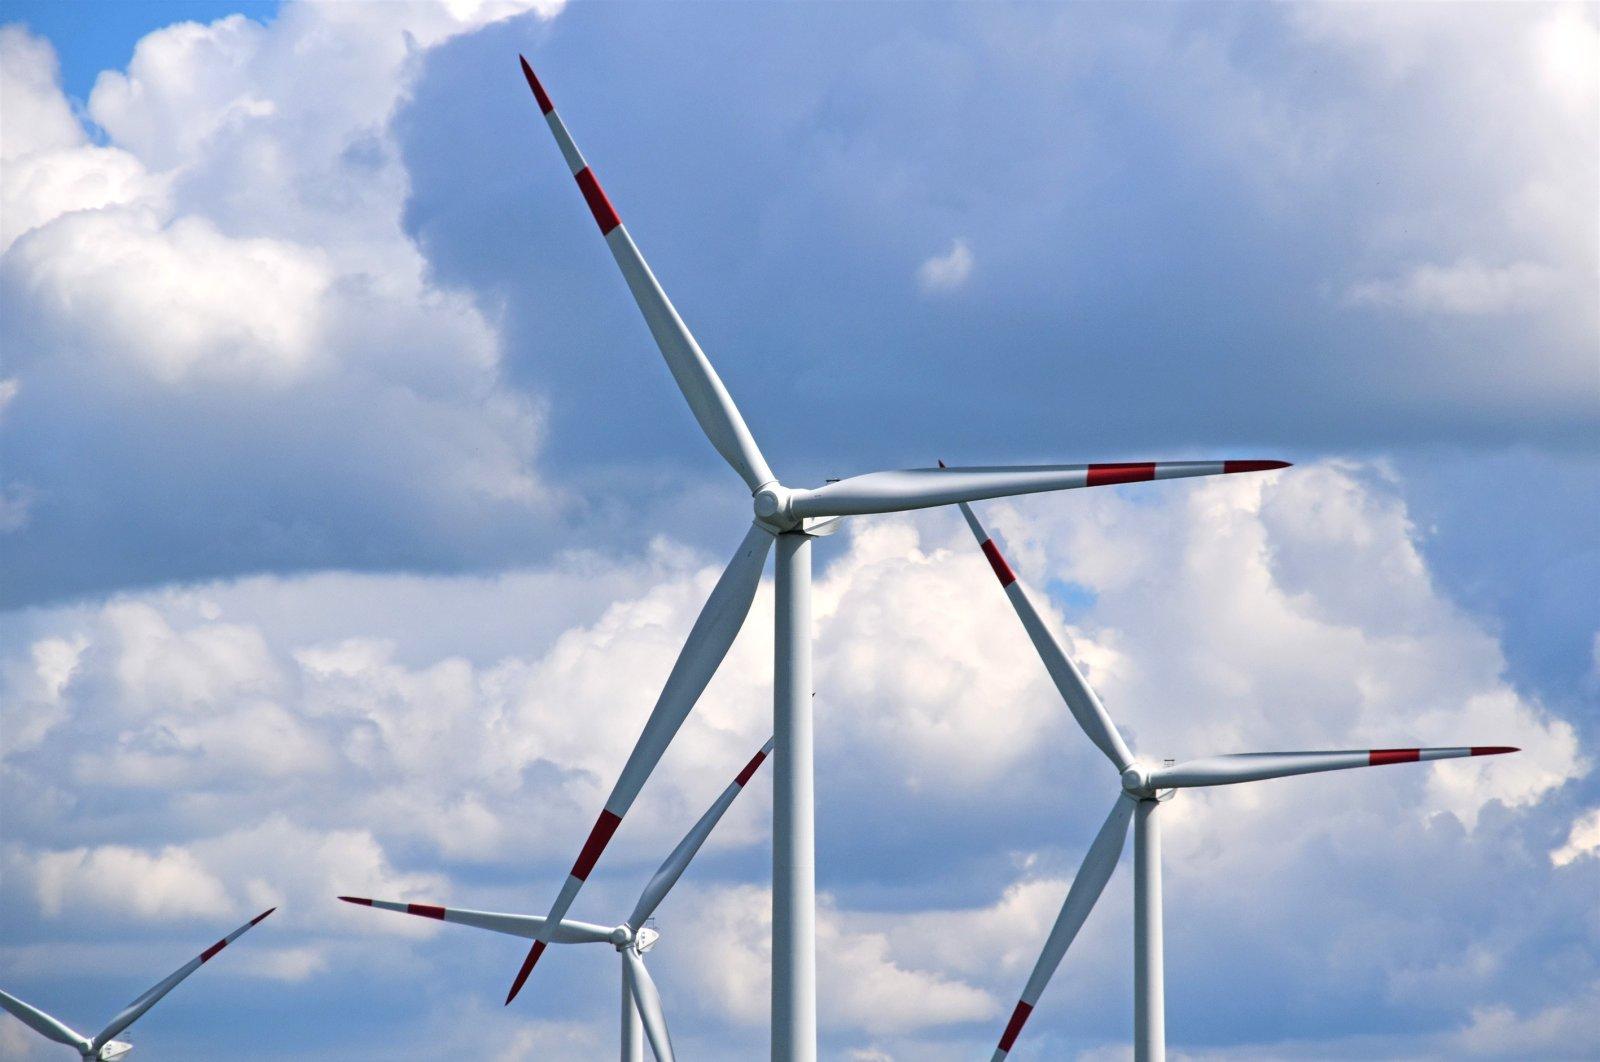 Wind turbines in western Turkey's İzmir, Aug. 17, 2020. (IHA Photo)